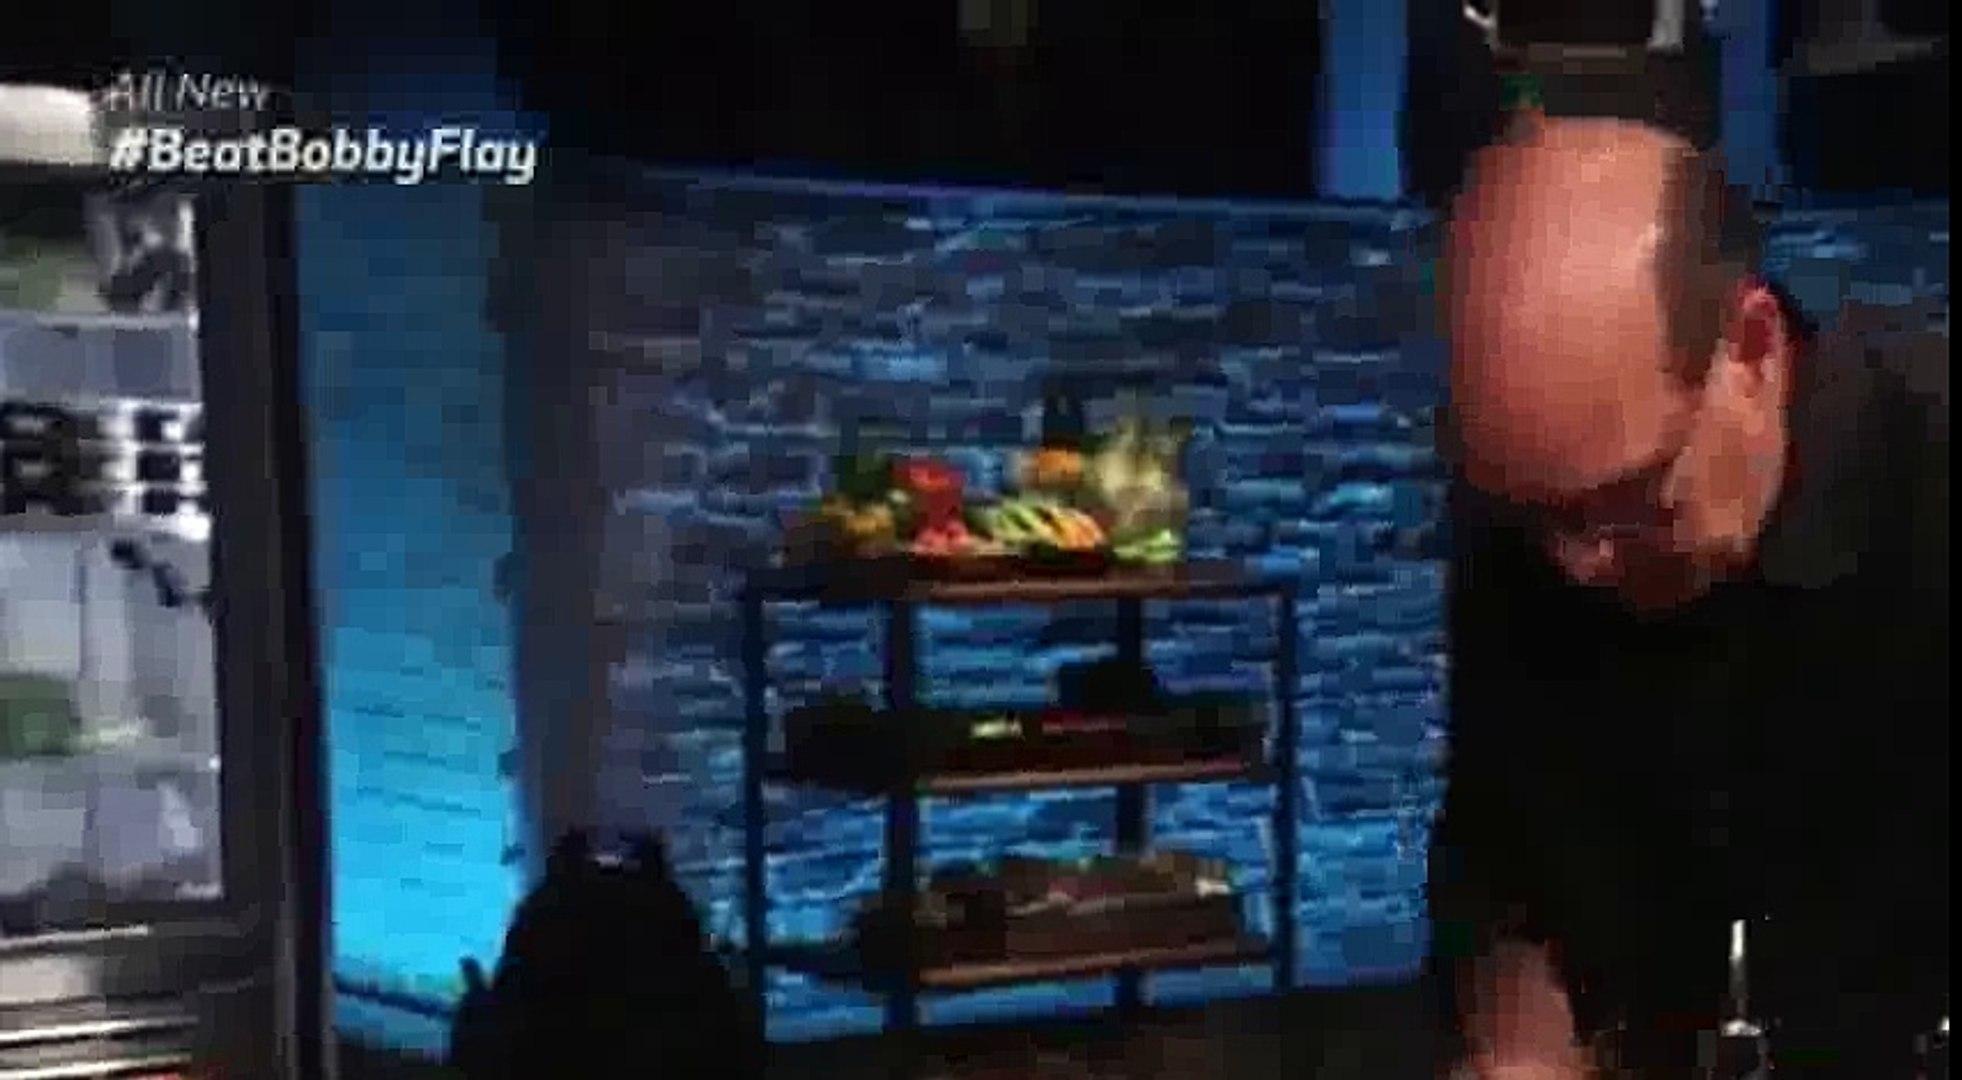 Beat Bobby Flay S09E12 - Bobbys Dmv Appointment.